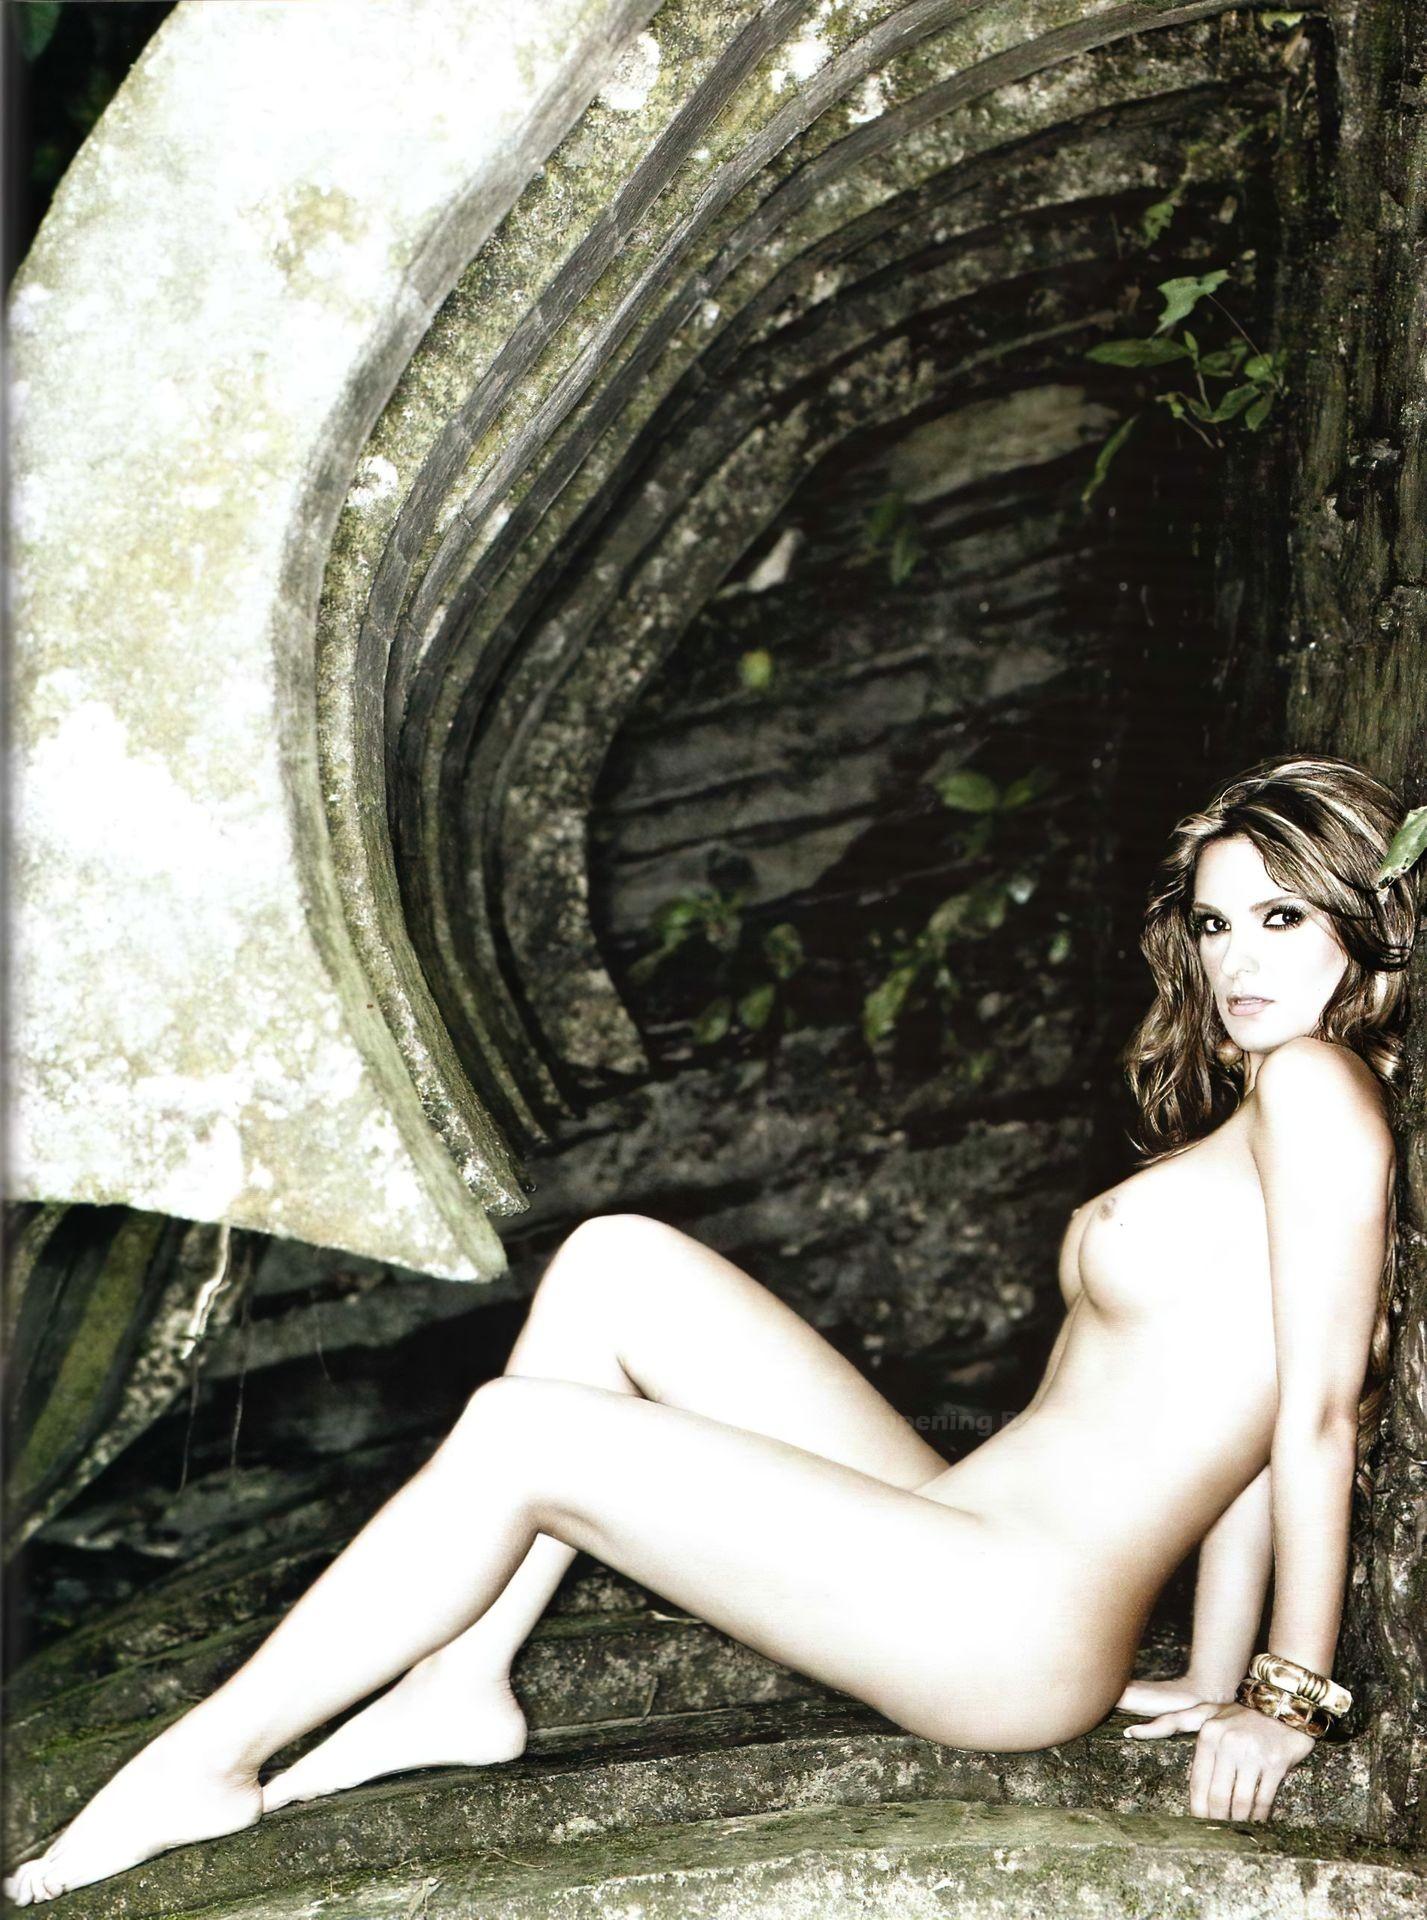 Mariana seoane nude pics, page